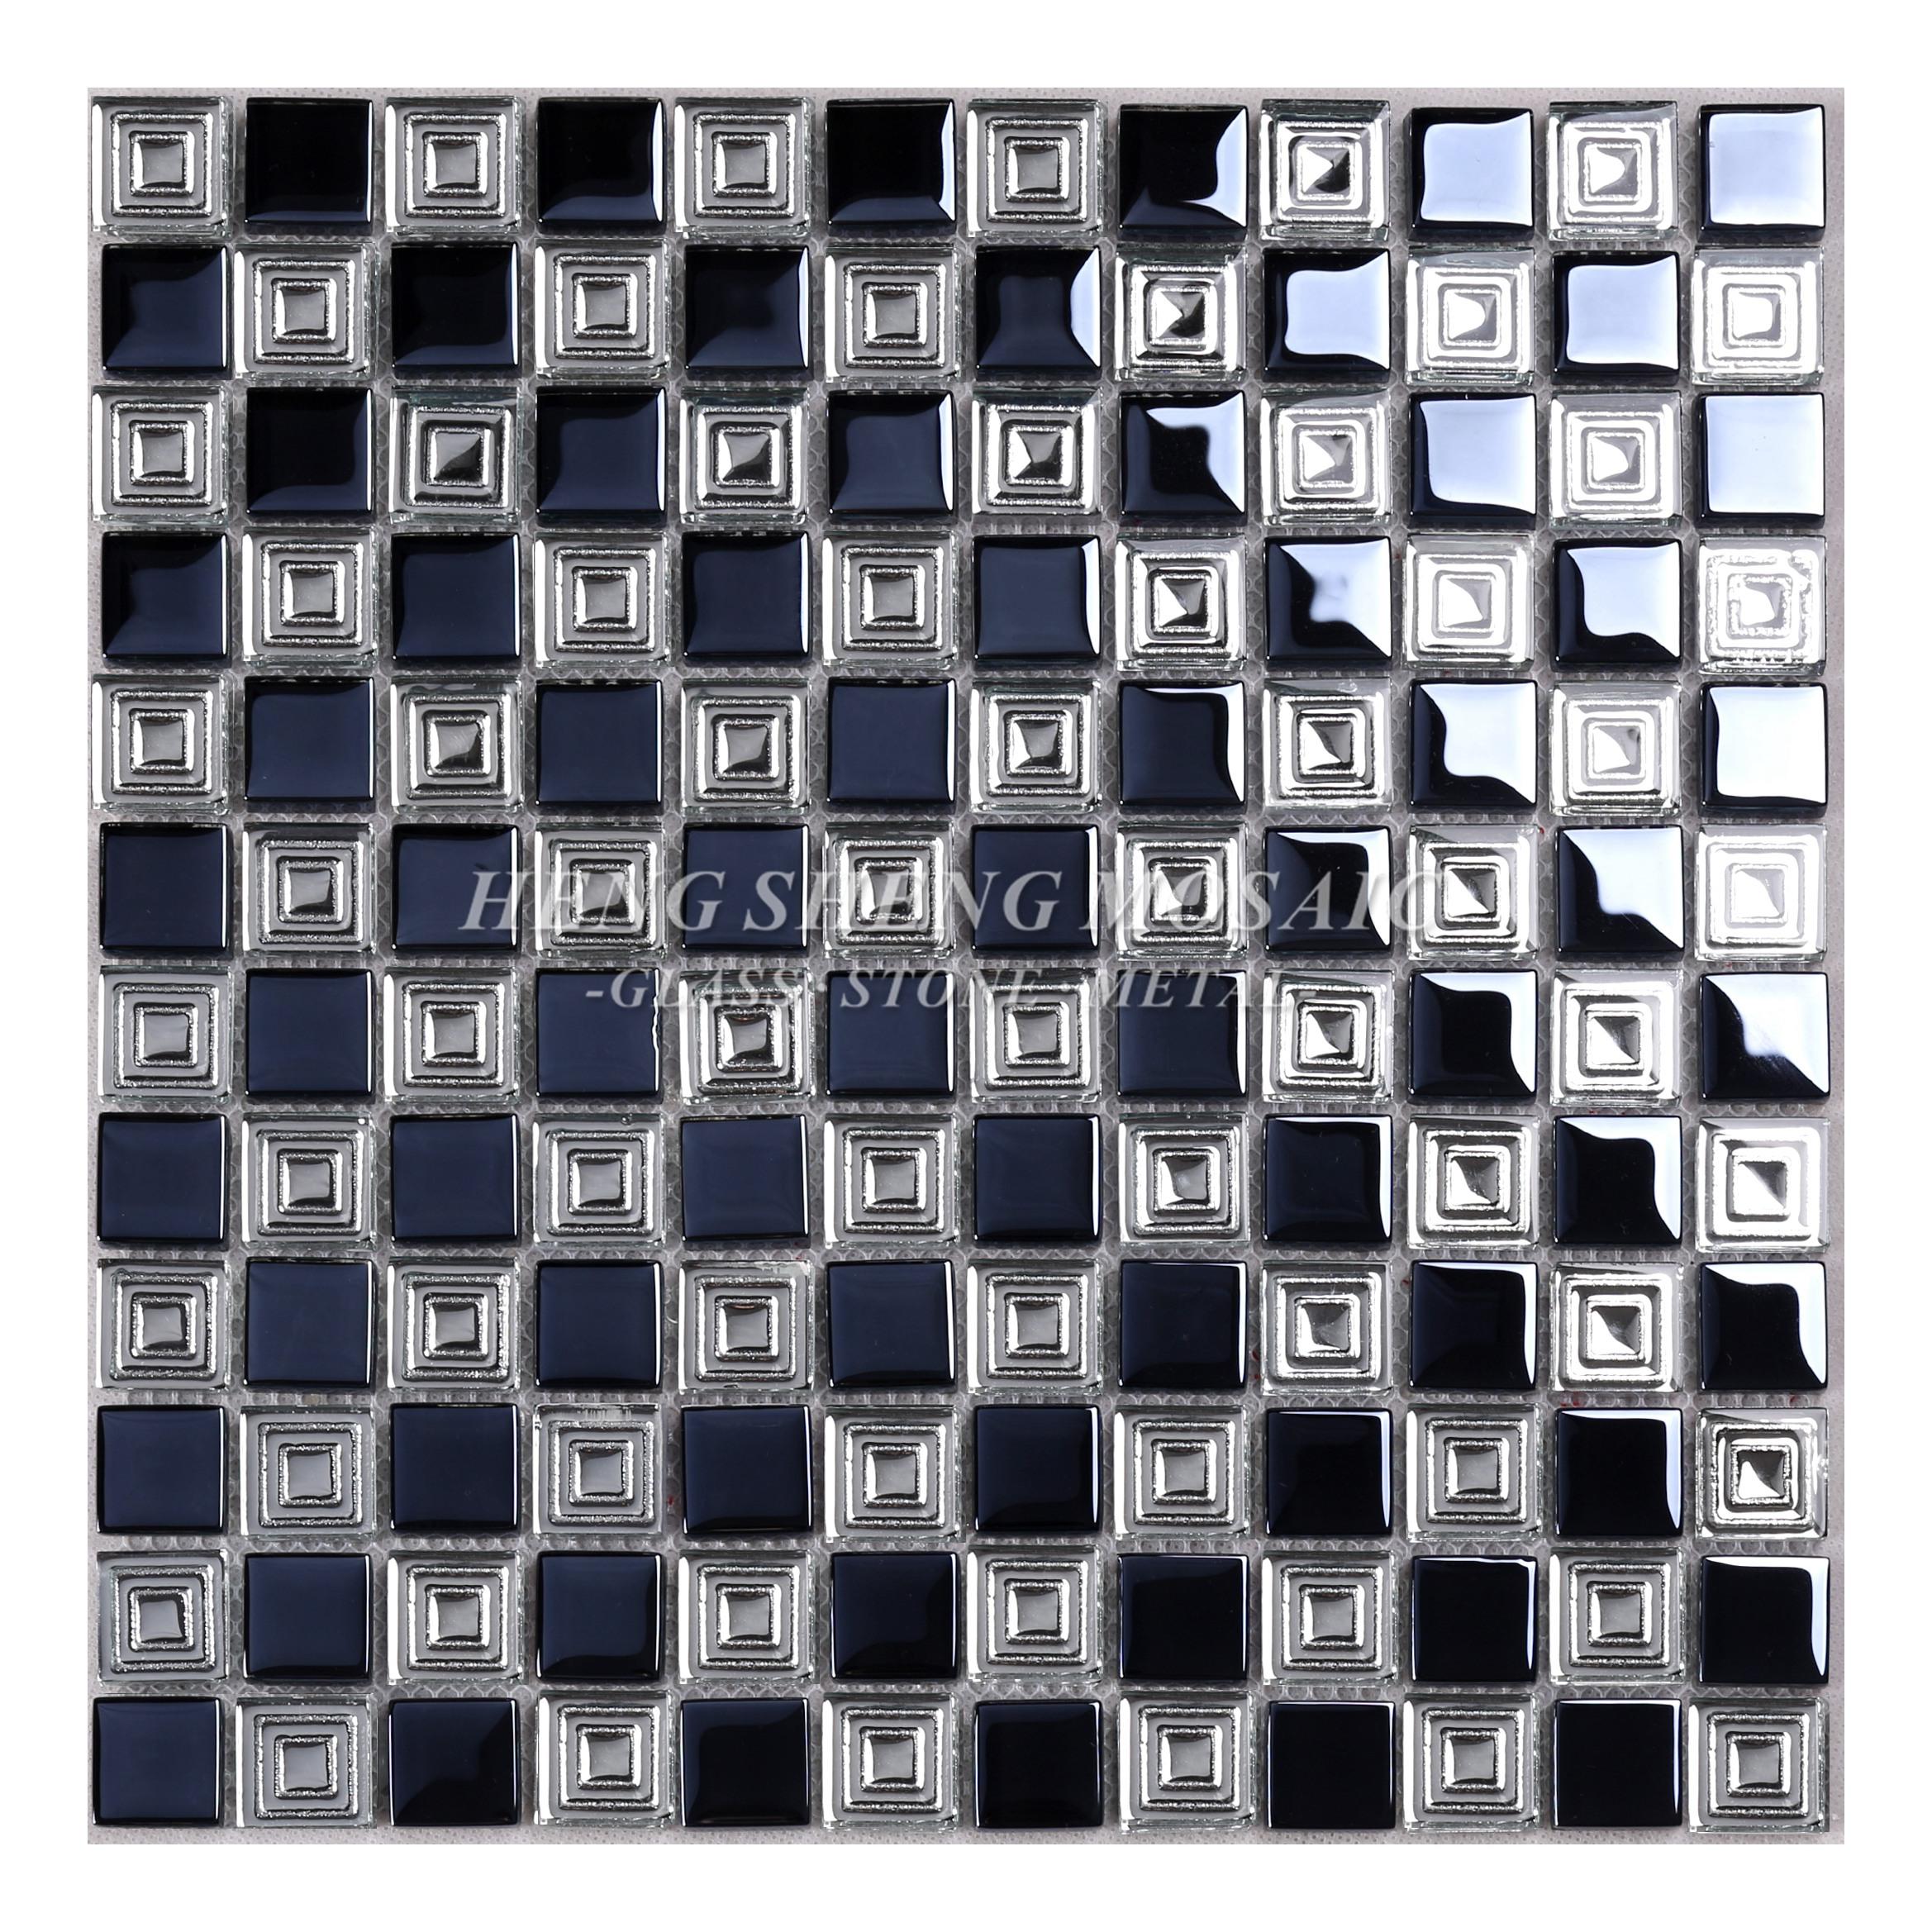 hot sale tempered philippines black glass mosaic kitchen backsplash tile view glass backsplash tile heng sheng product details from foshan hengsheng